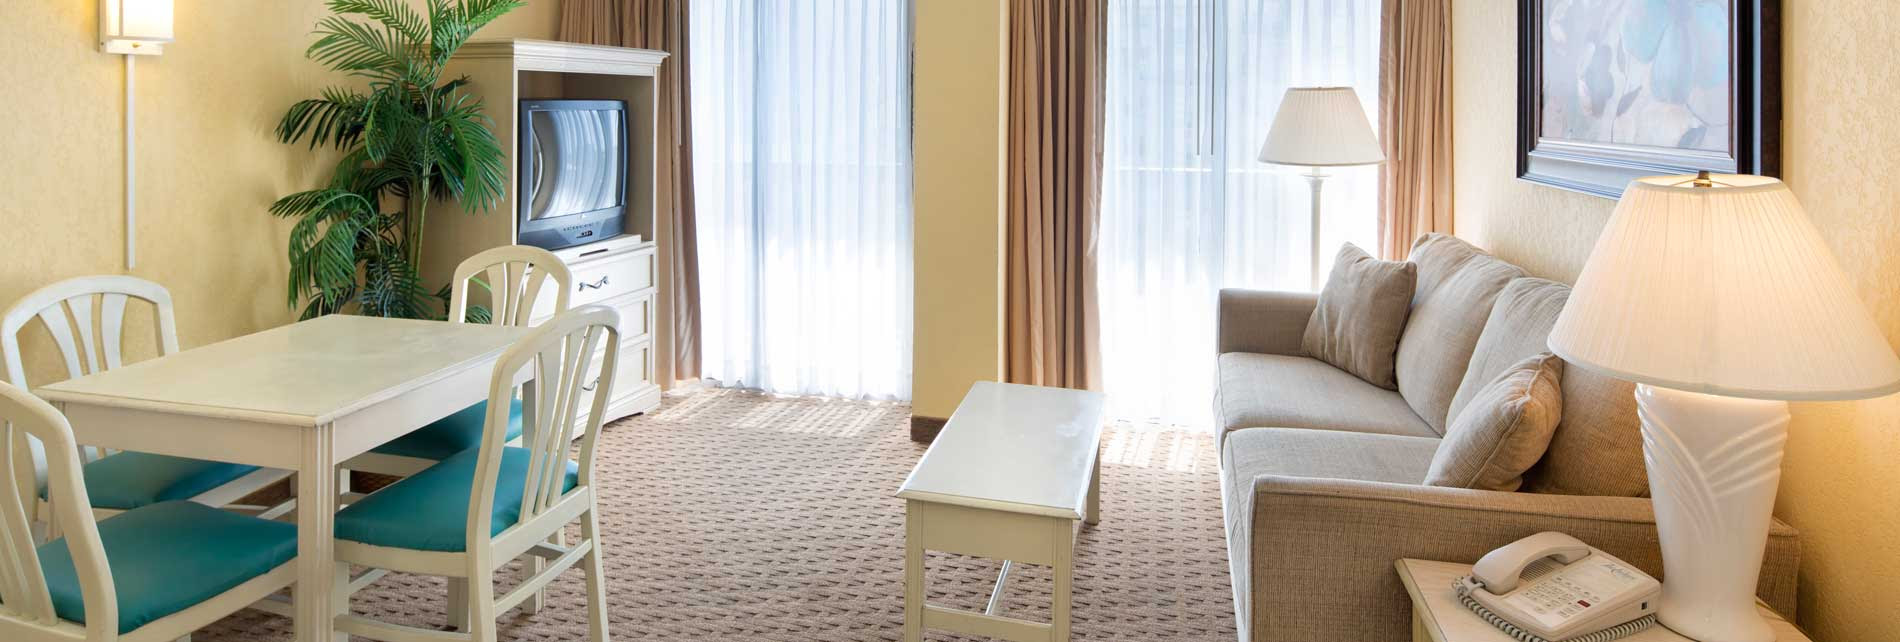 Two Bedroom Suite Orlando The Enclave Hotel Suites